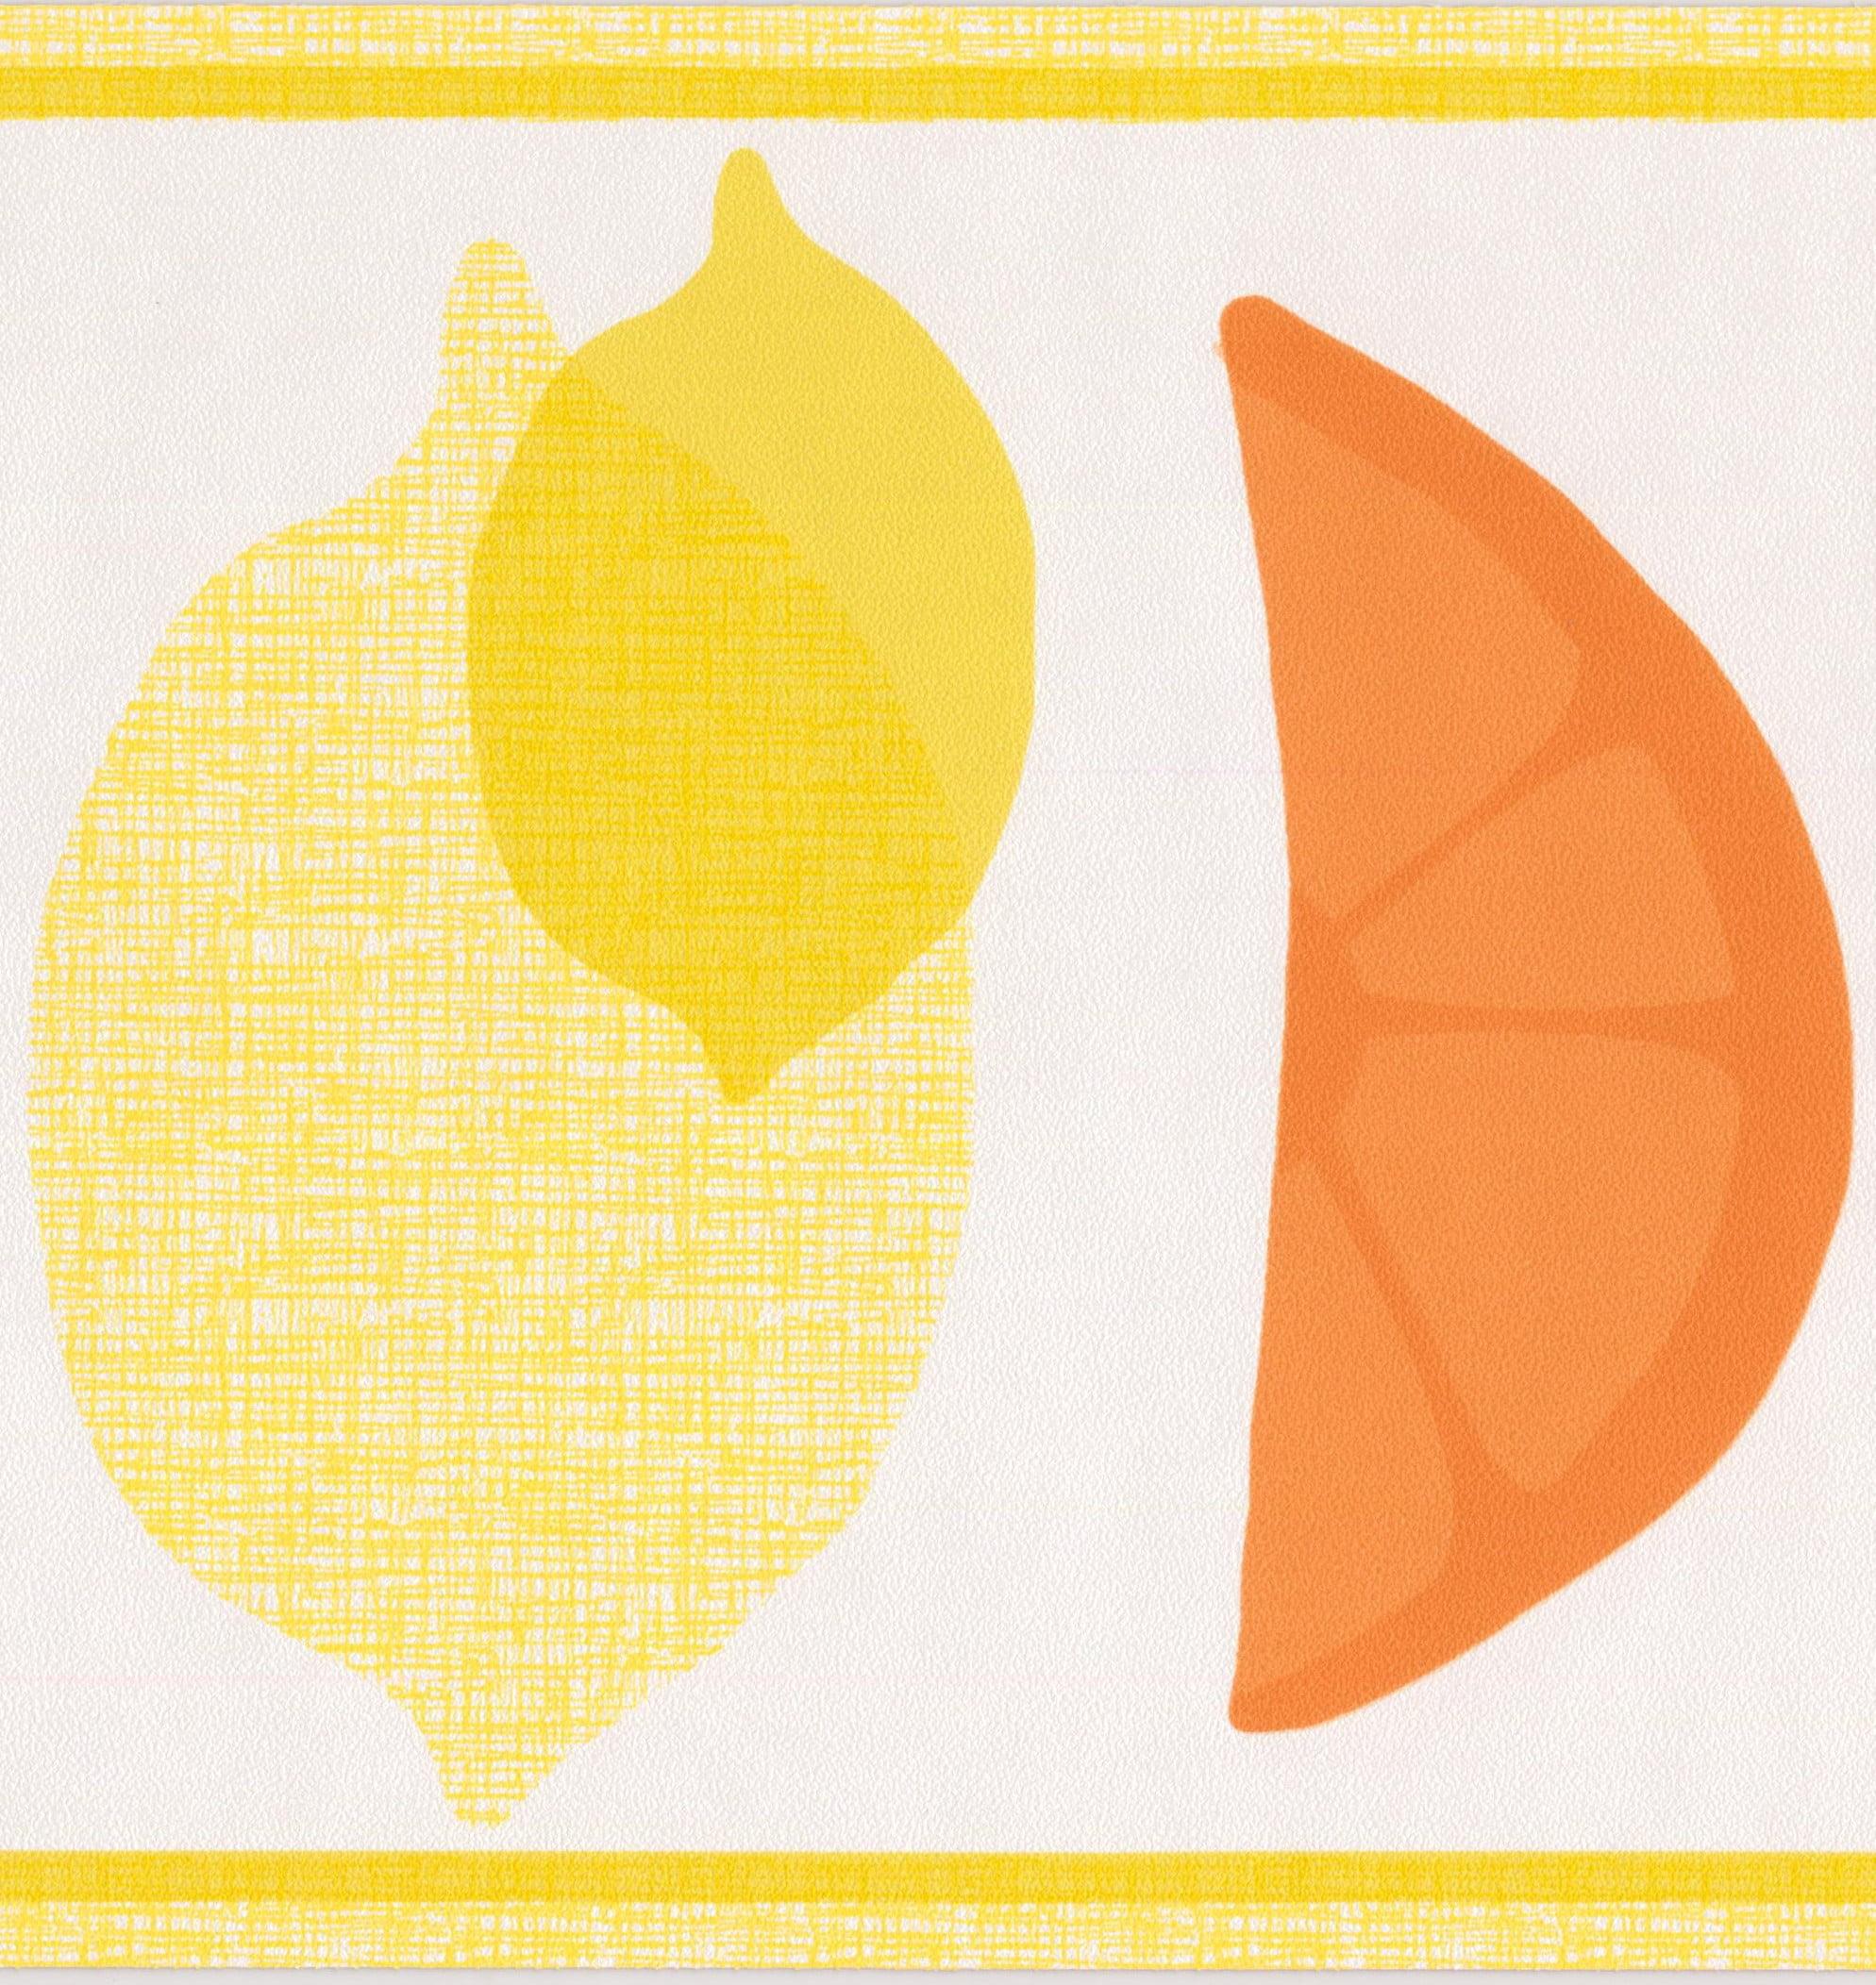 Kids Drawn Fruits Apple Lemon Orange Colors Wallpaper Border Kitchen  Bathroom Design, Roll 15u0027 X 7u0027u0027